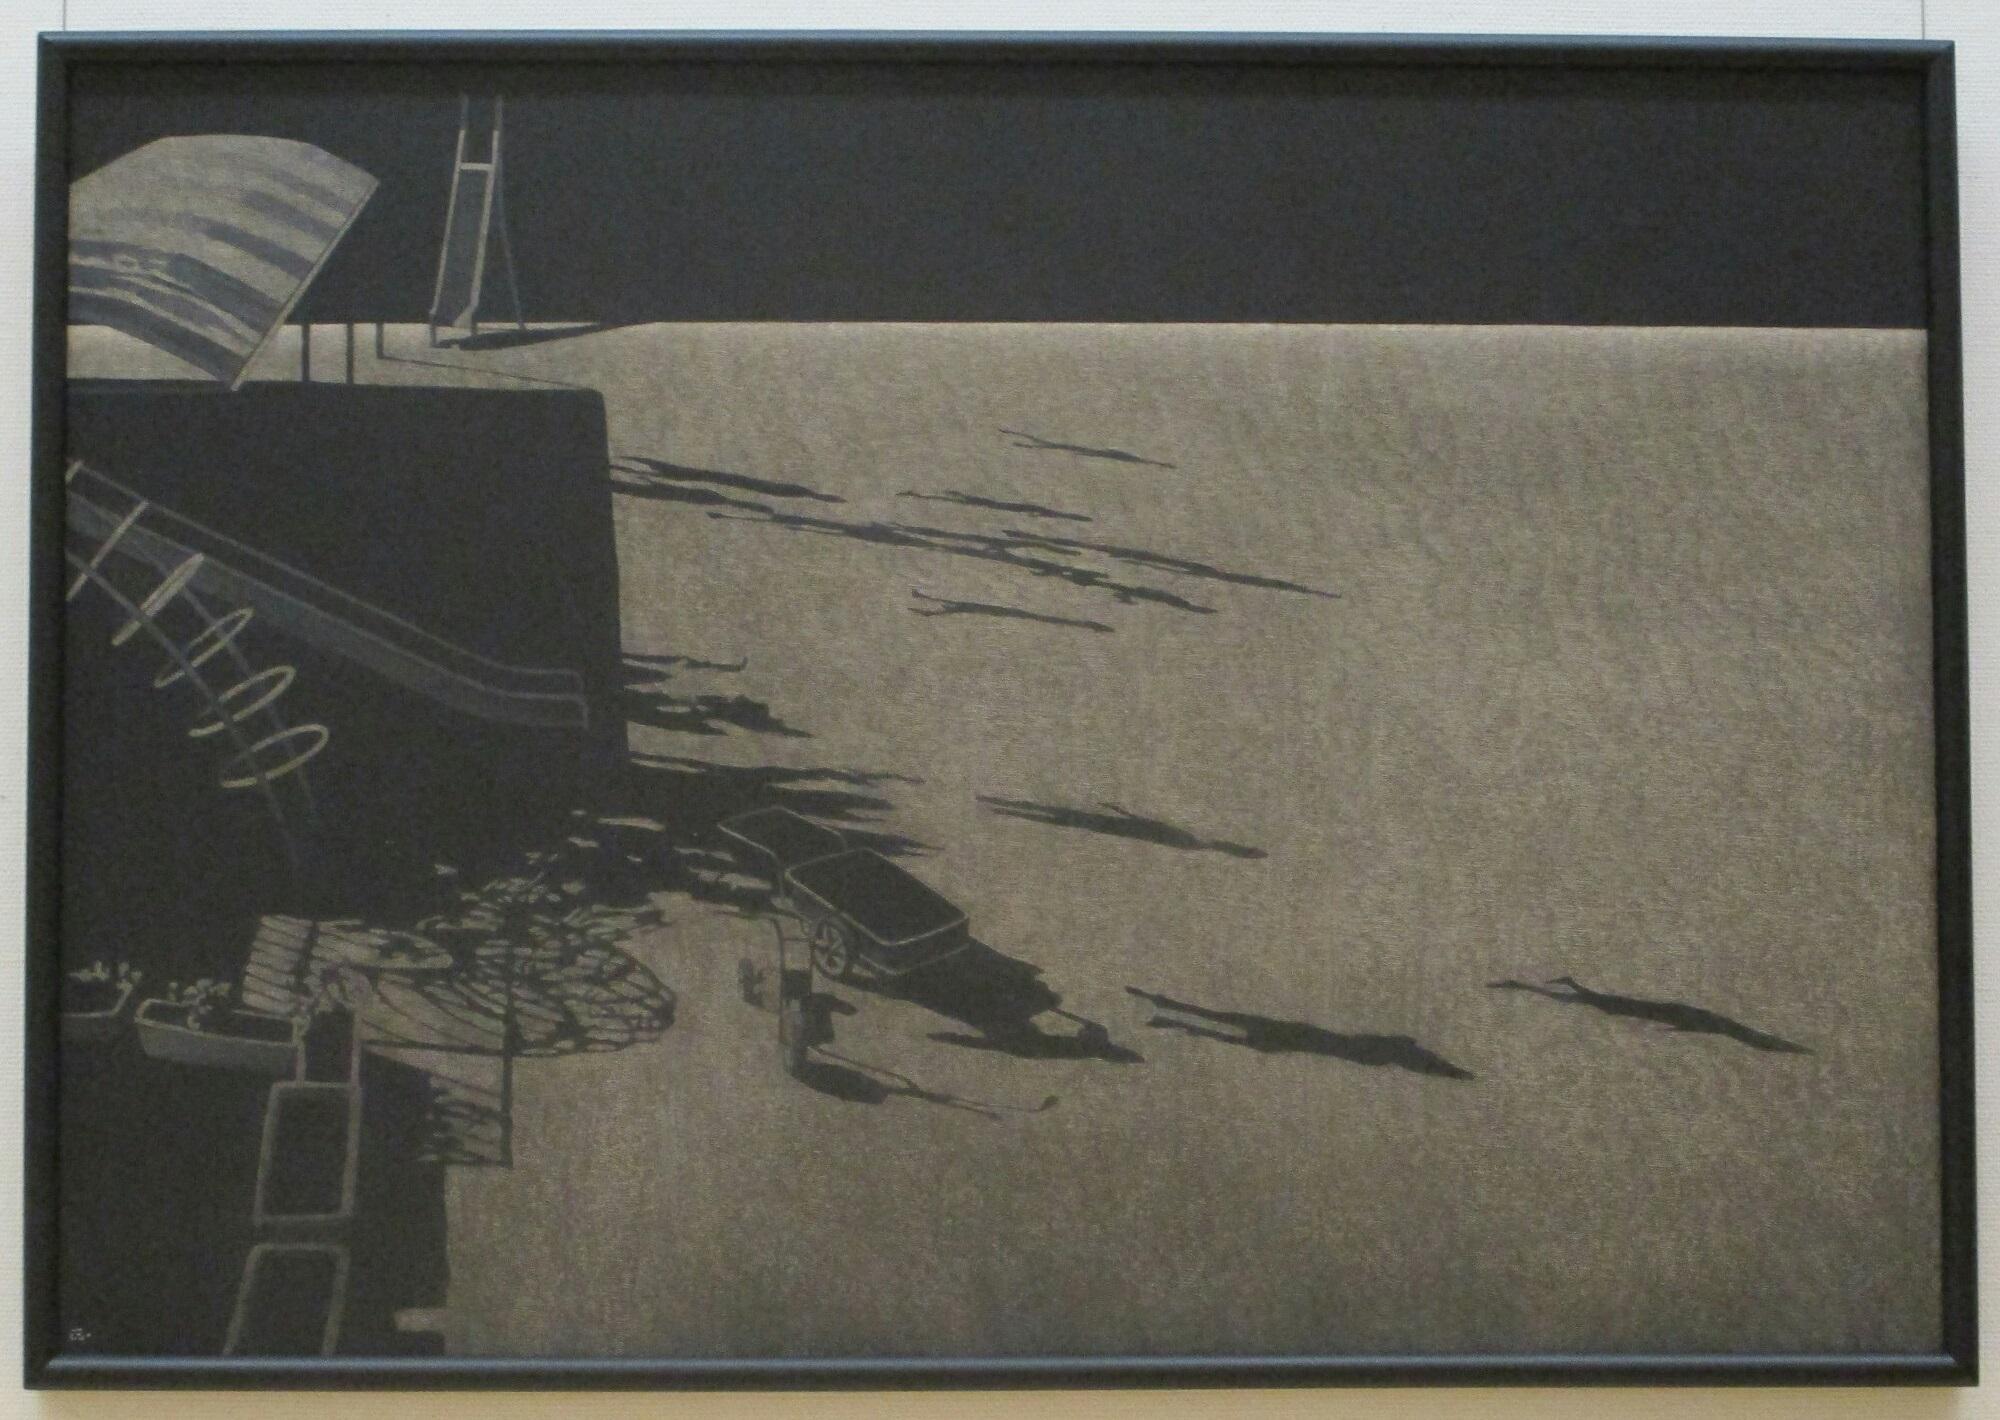 2019.4.27 (16) 濃淡の表現展 - 園庭 2000-1420